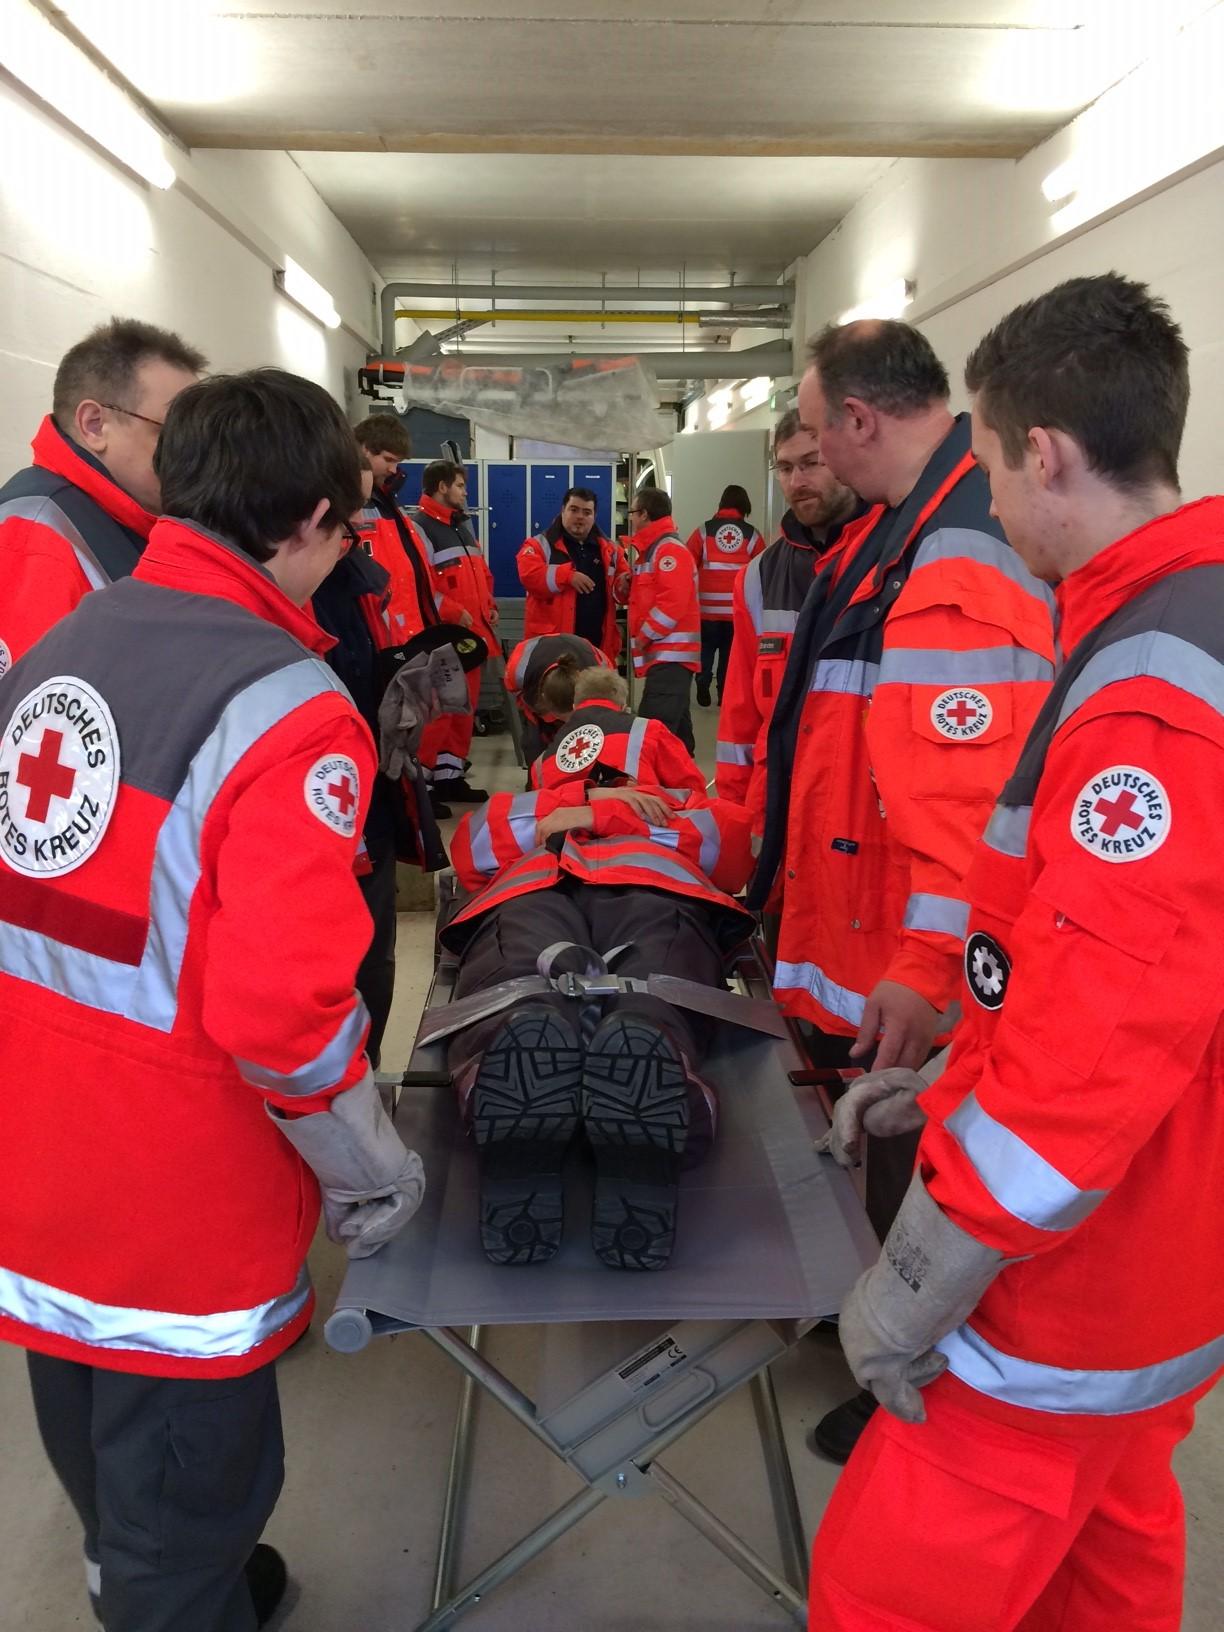 Rettungssanitäter ausbildung  Ausbildung | DRK Bochum – Gemeinschaft Nord